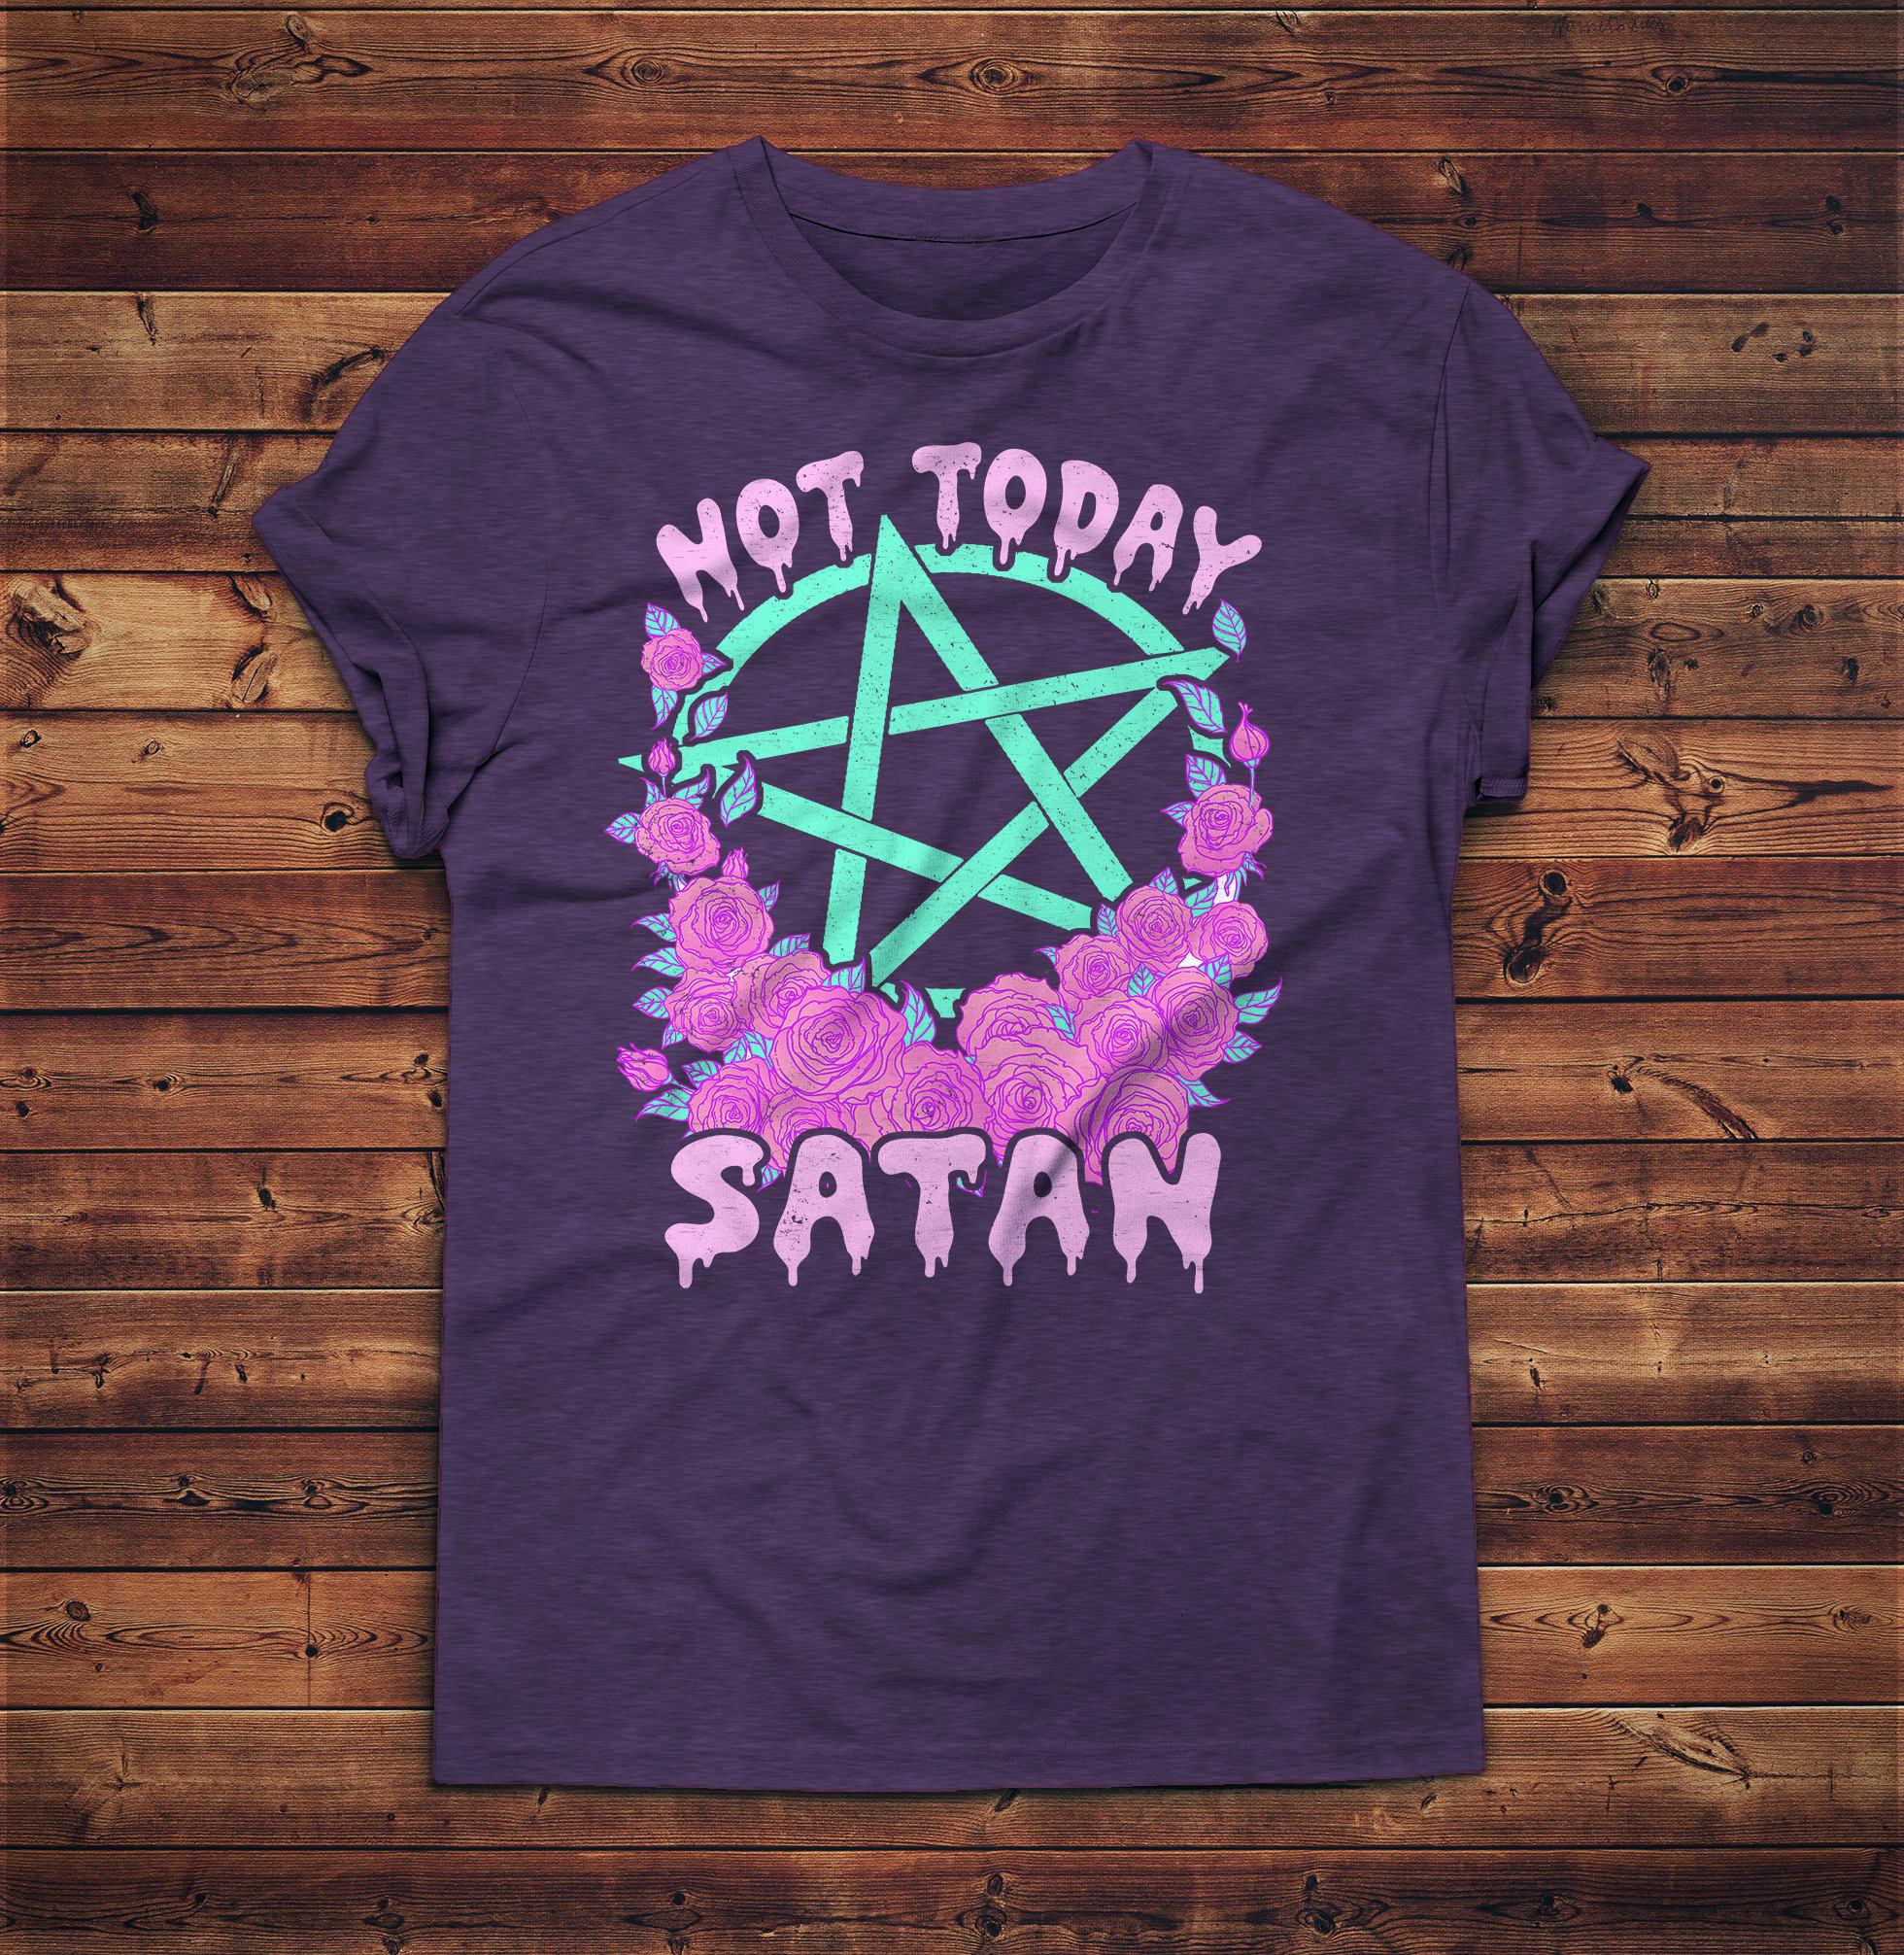 Not Today Satan Vaporwave Aesthetic Clothing Aesthetic